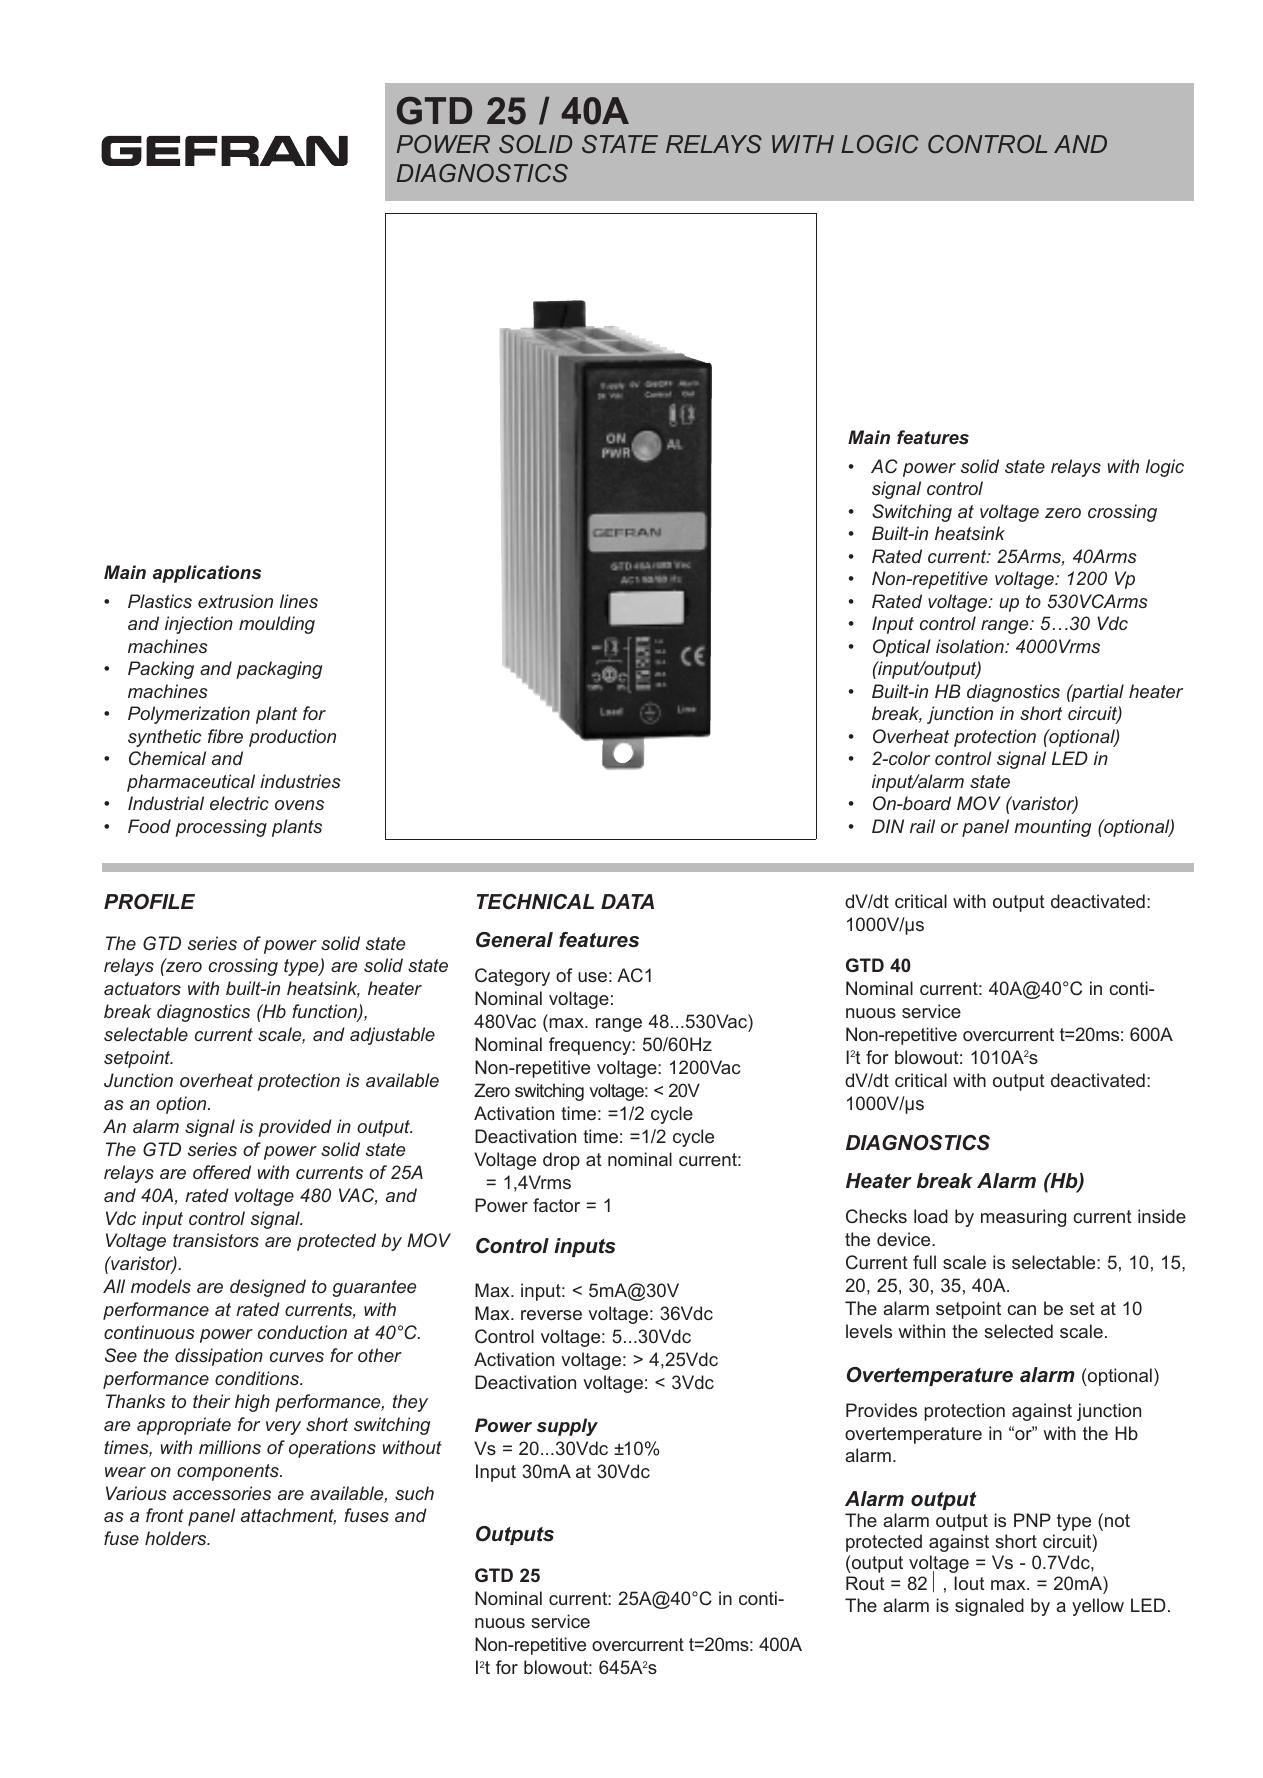 GEFRAN GTF-25-480-1-0-0-0 POWER CONTROLLER NEW